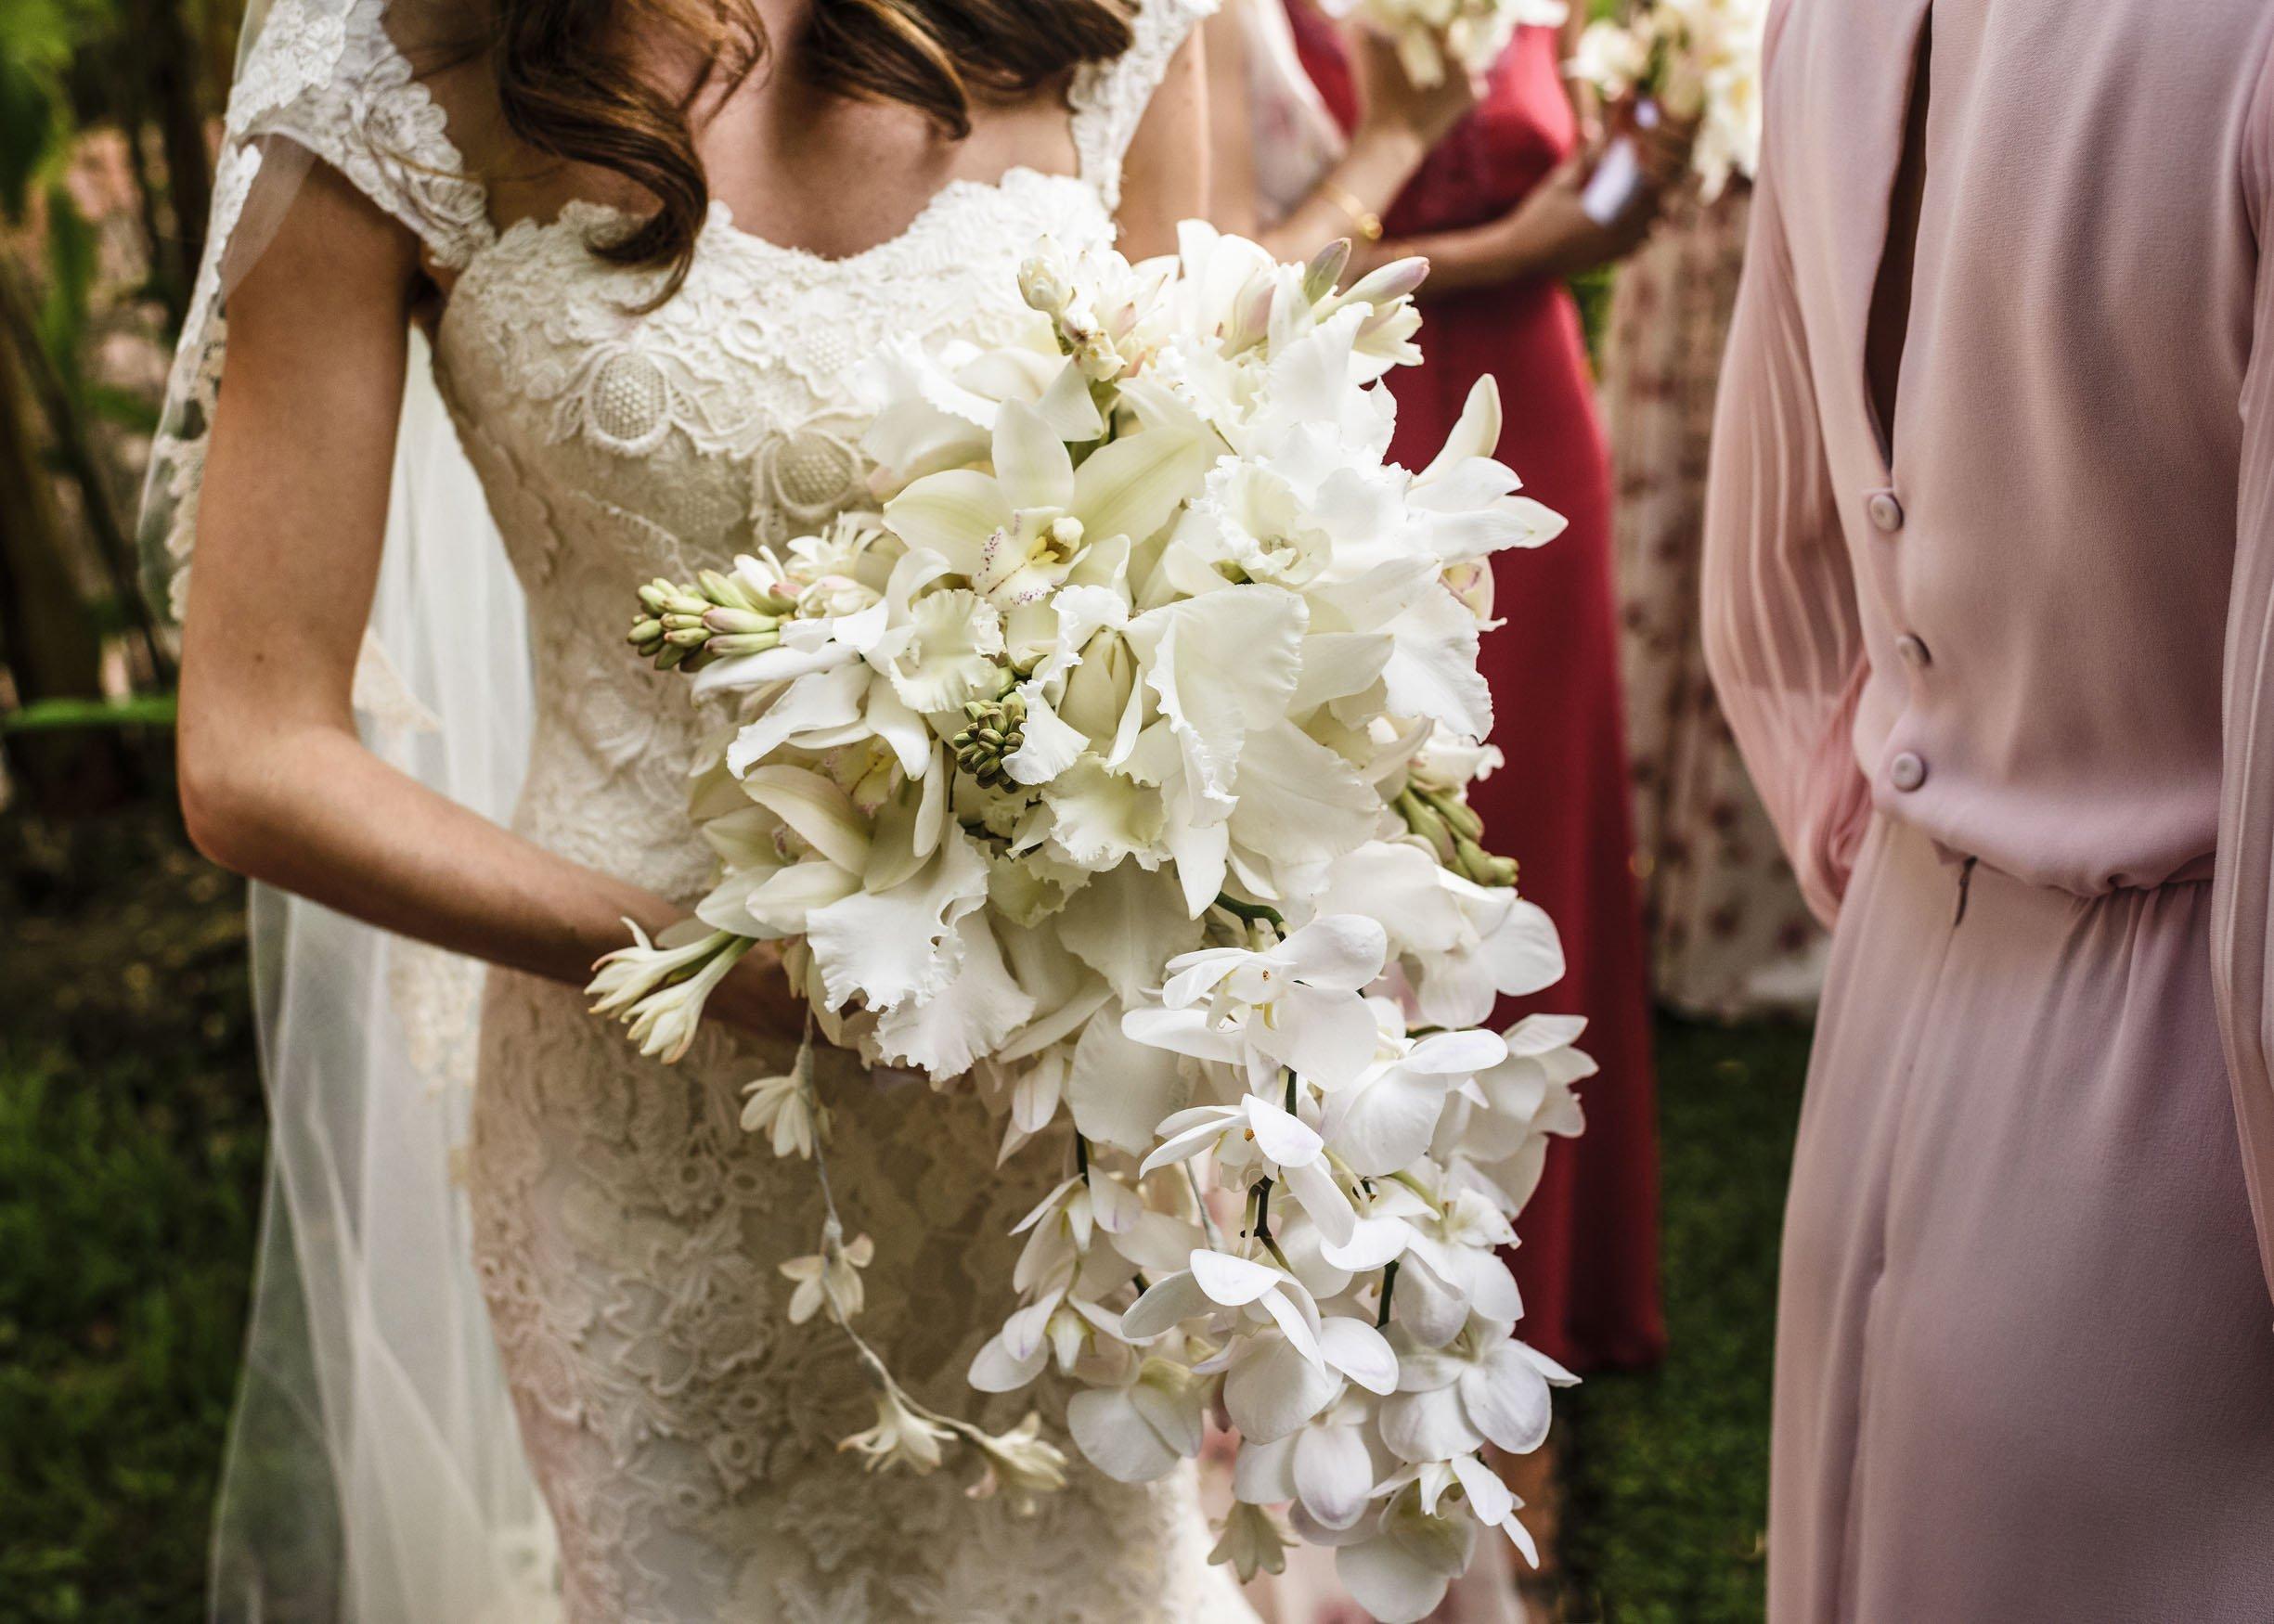 My bridal bouquet.